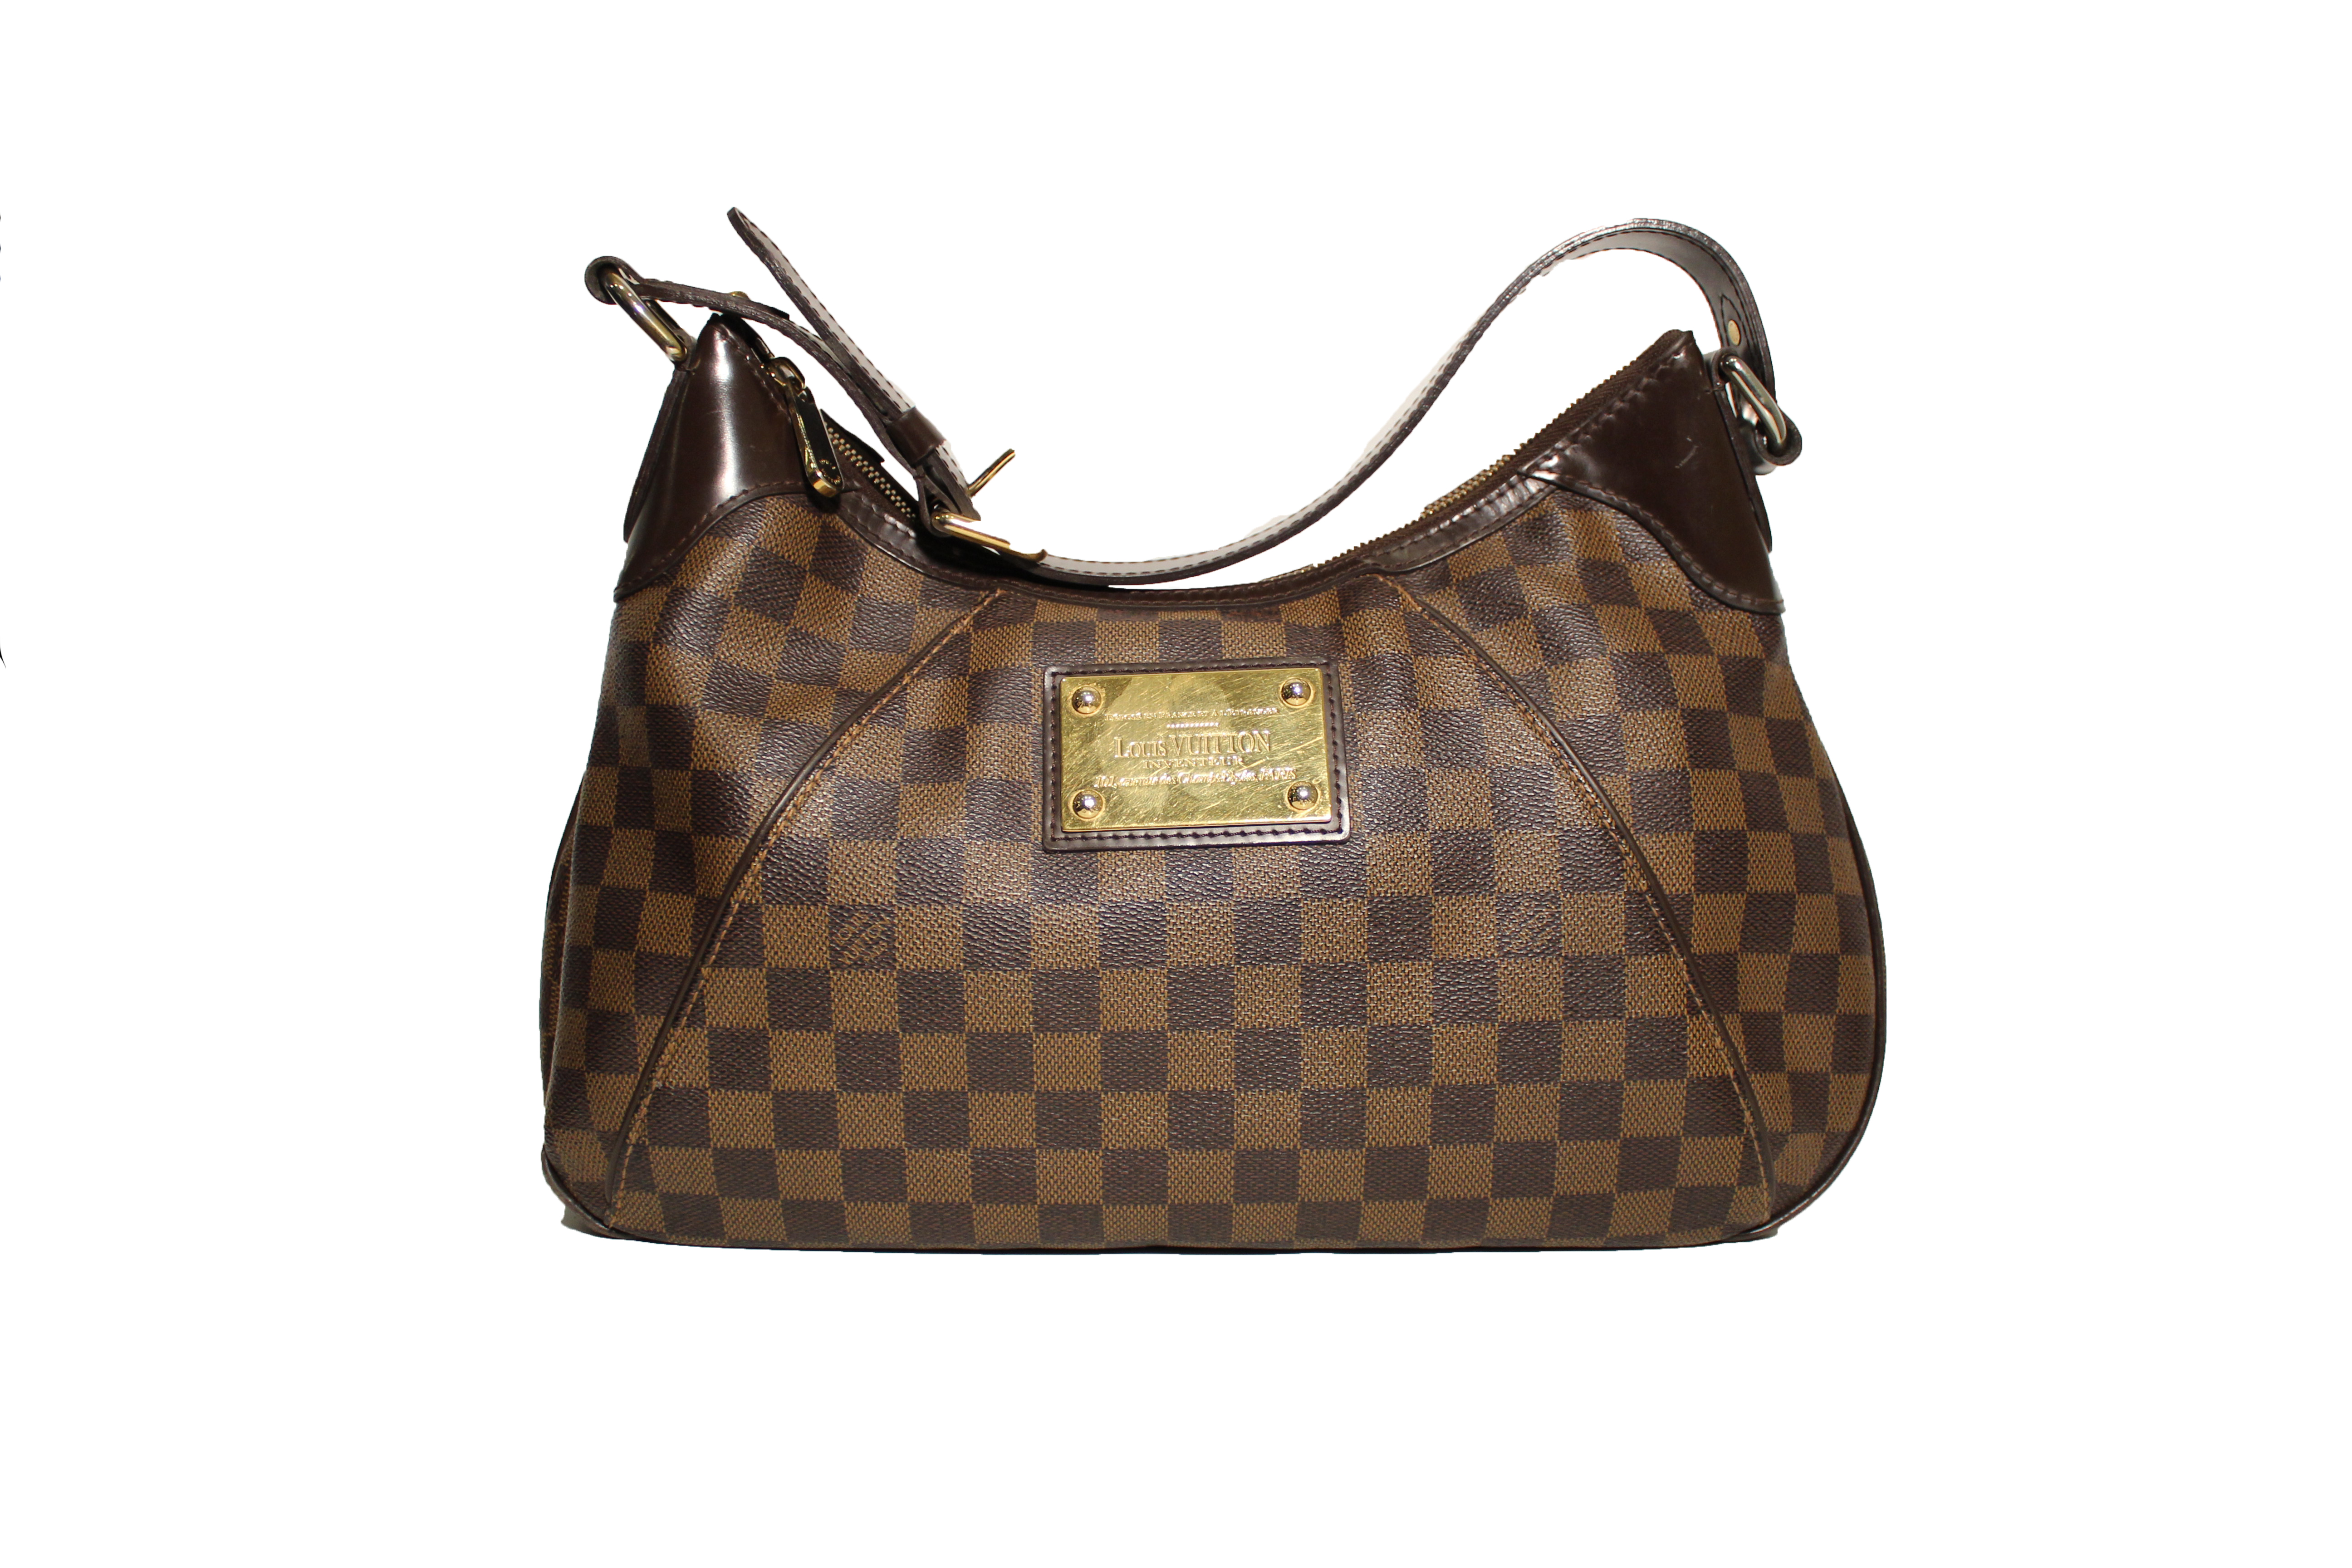 Louis Vuitton Damier Ebene Shoulder Bag 46